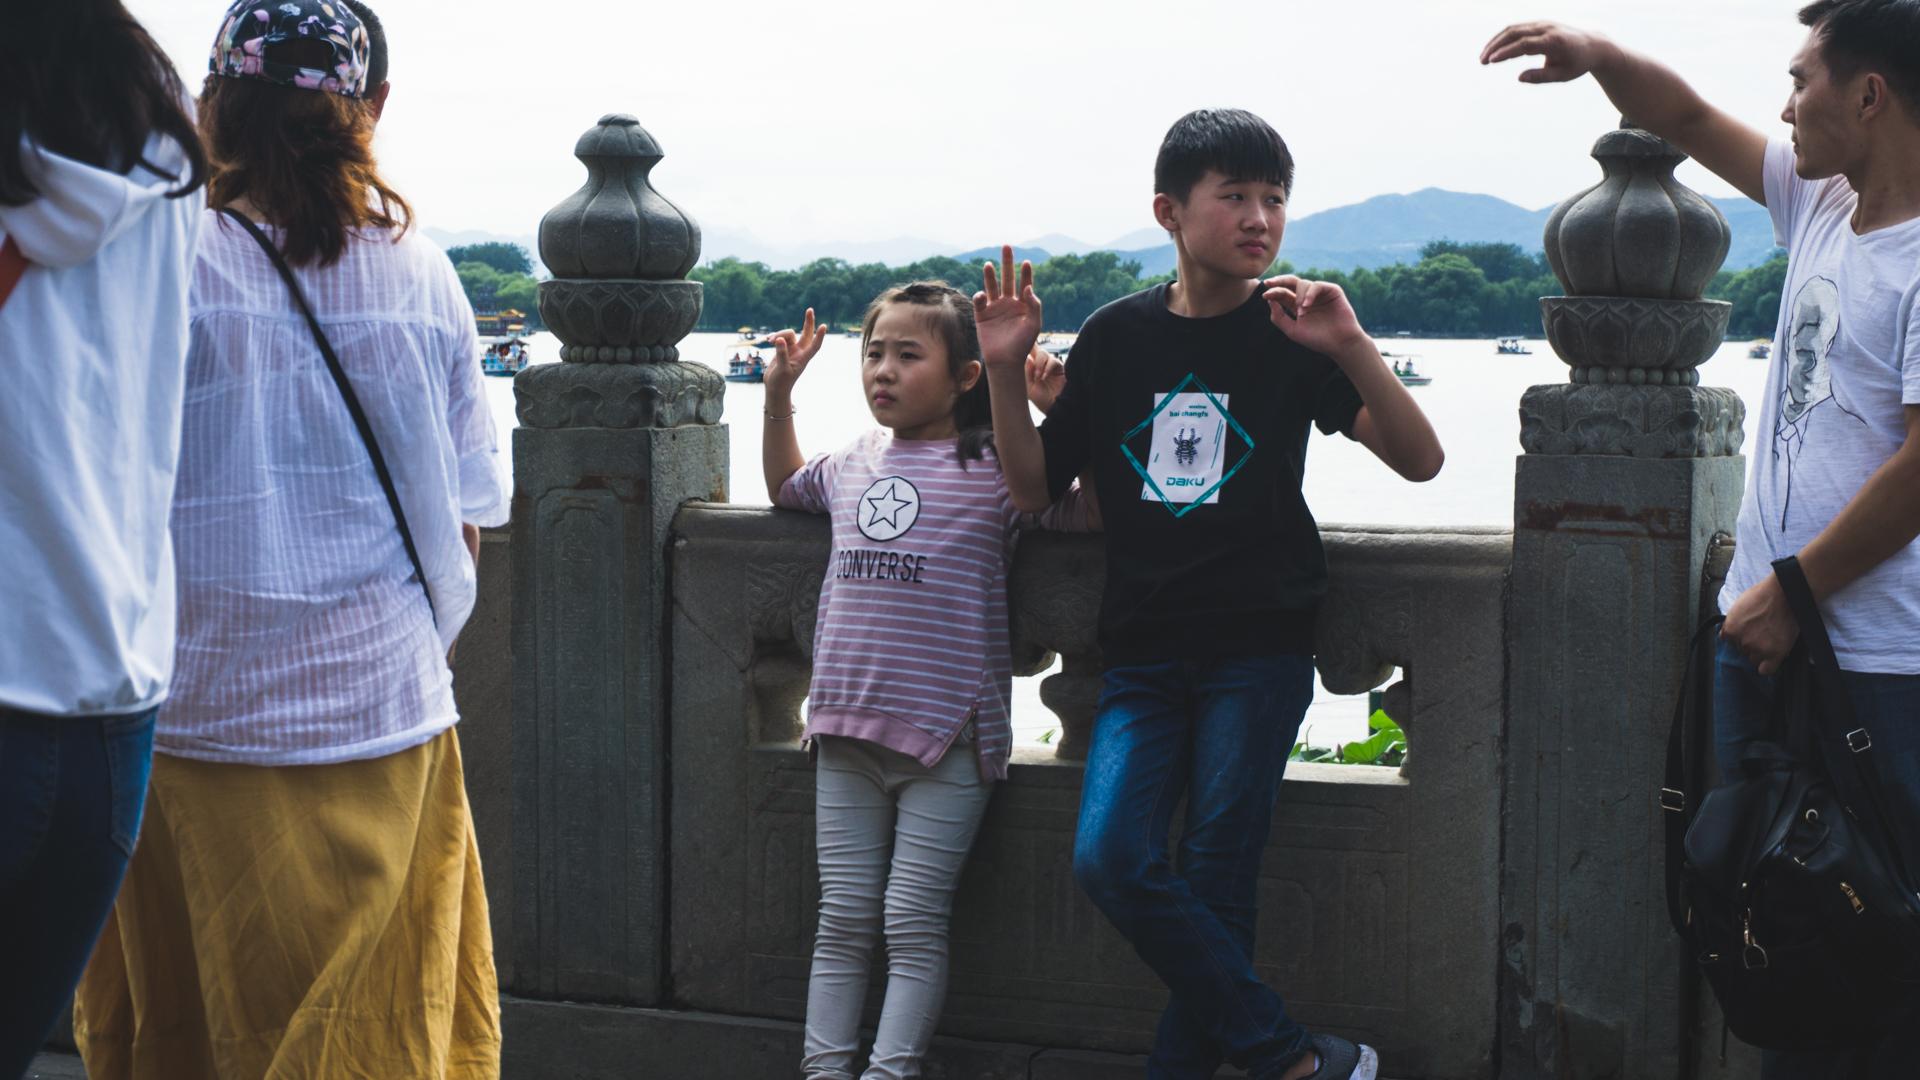 DSC09344_pechino_summer_palace_travel_psych_chiara_cina_china